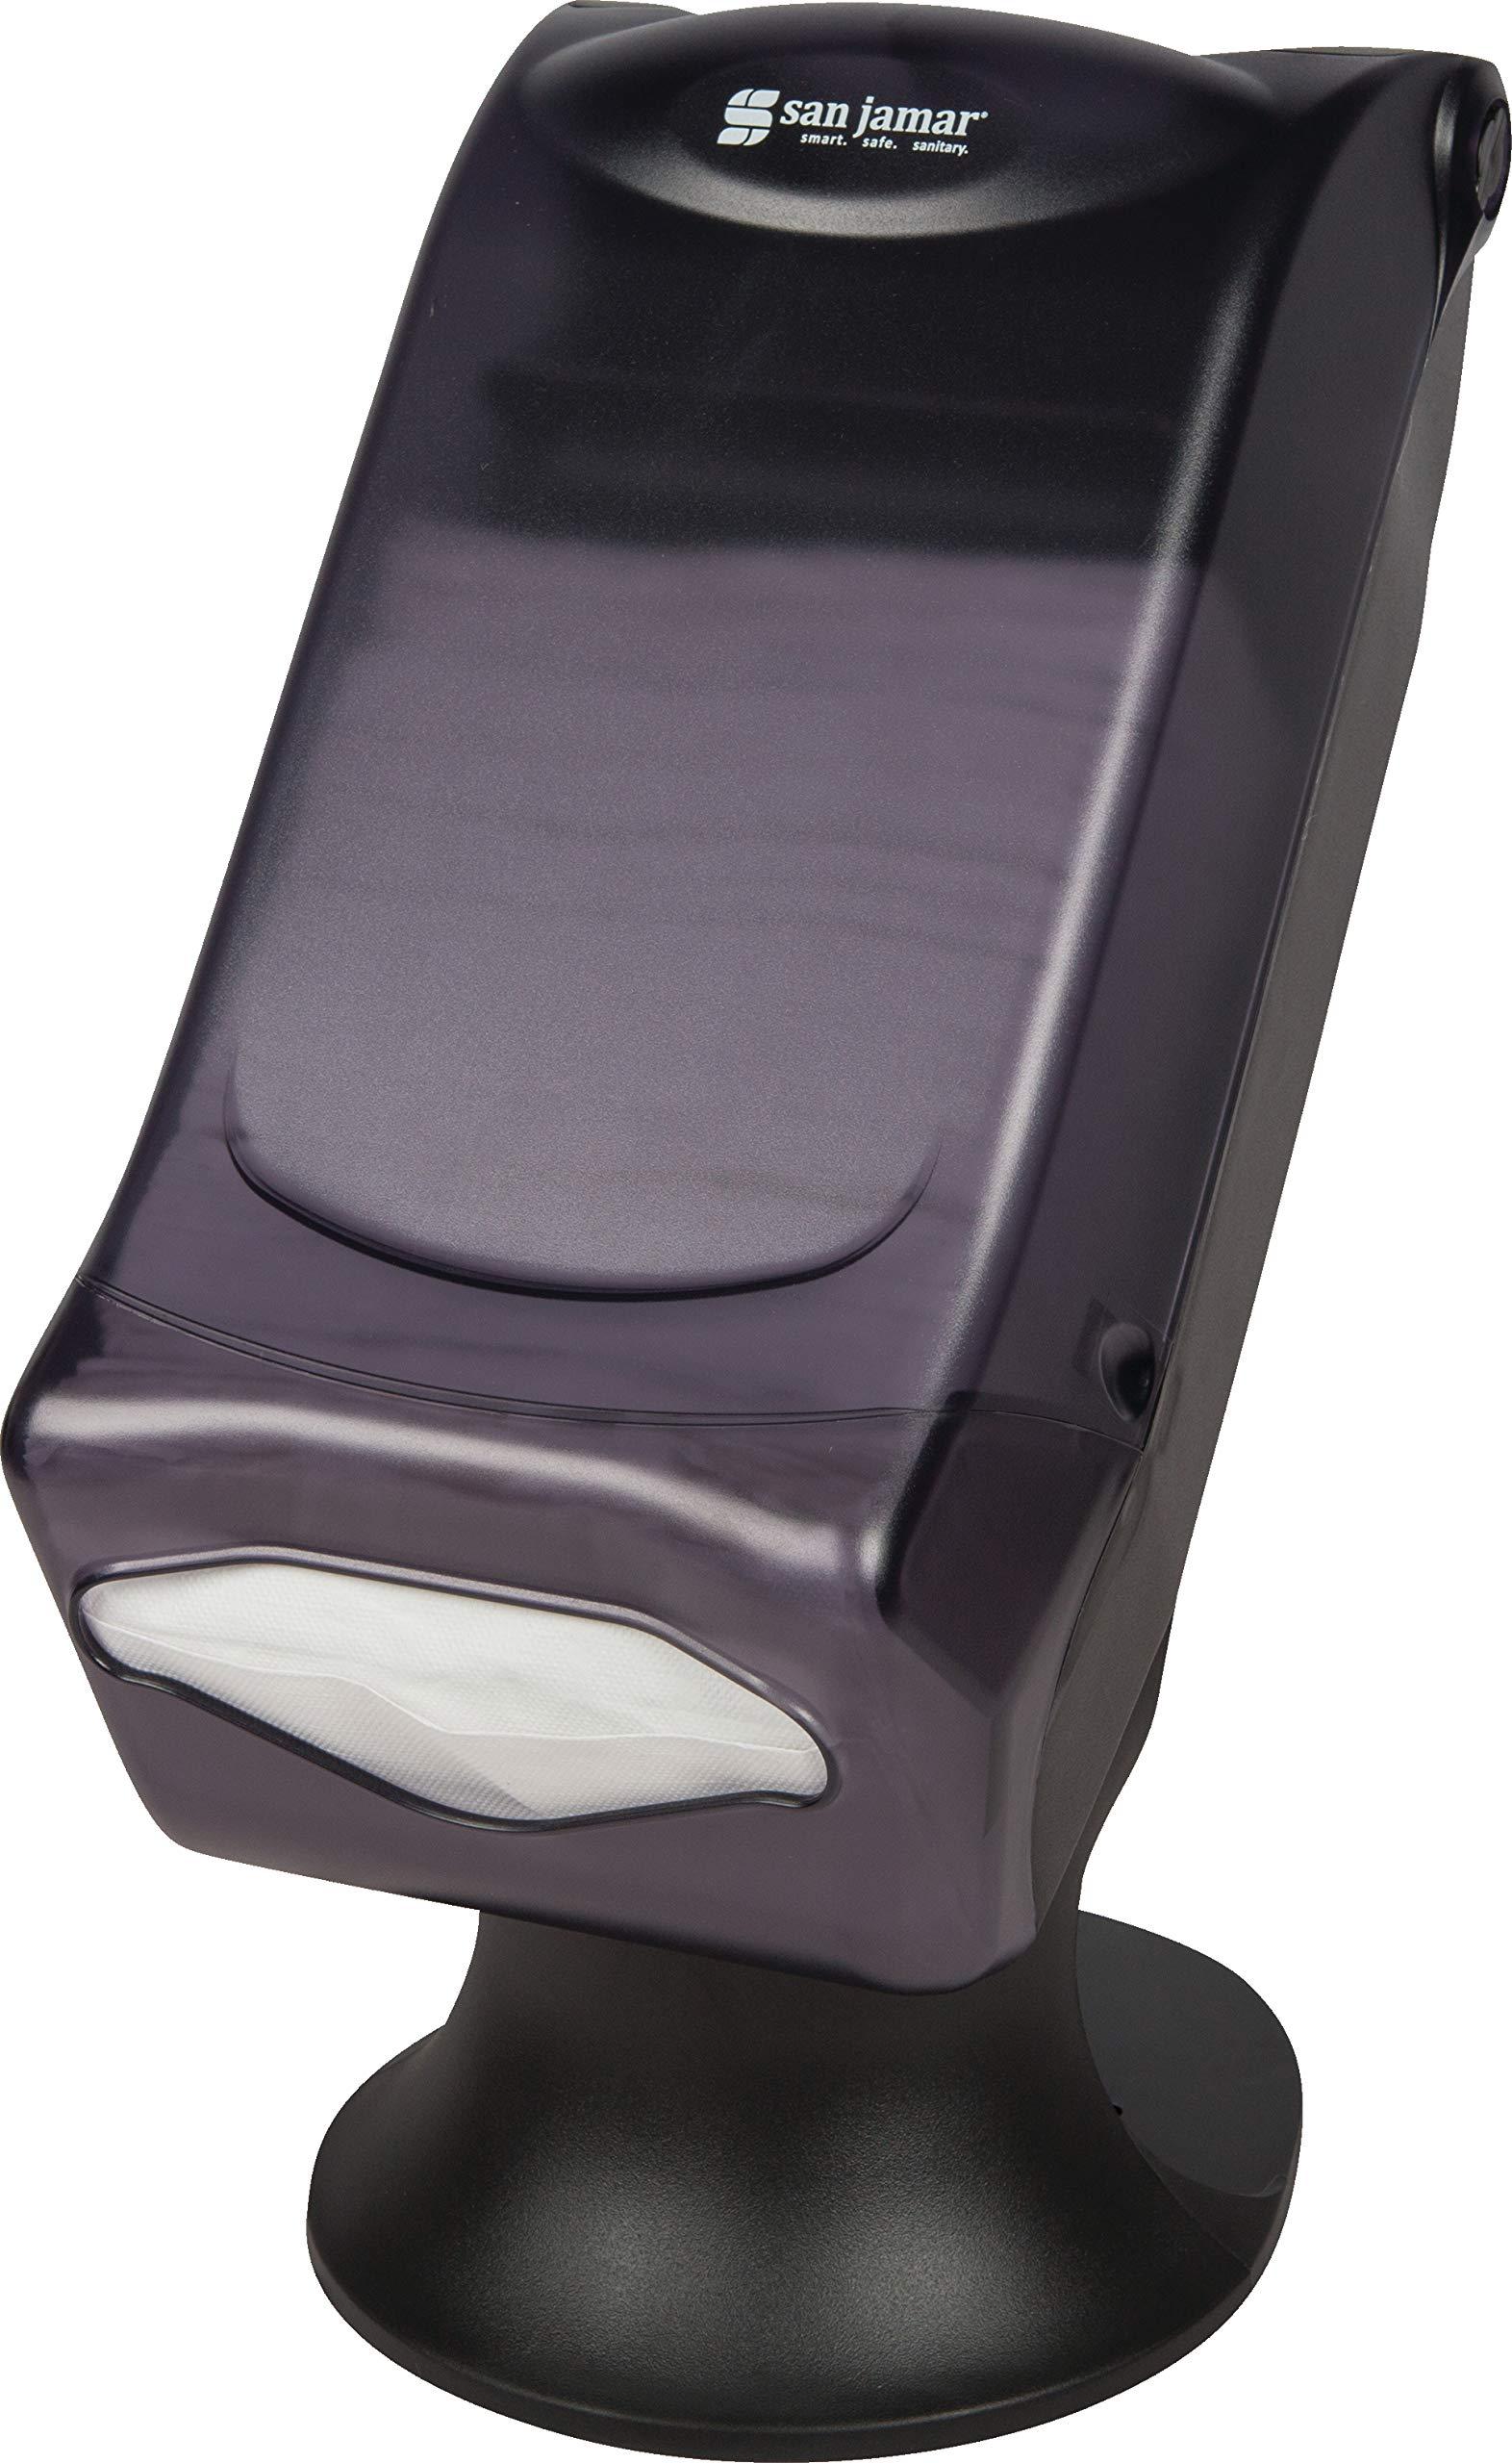 San Jamar H5005S Venue Fullfold Control Napkin Dispenser with Stand, 500 Capacity, 8'' Width x 17-1/2'' Height x 13'' Depth, Black Pearl by San Jamar